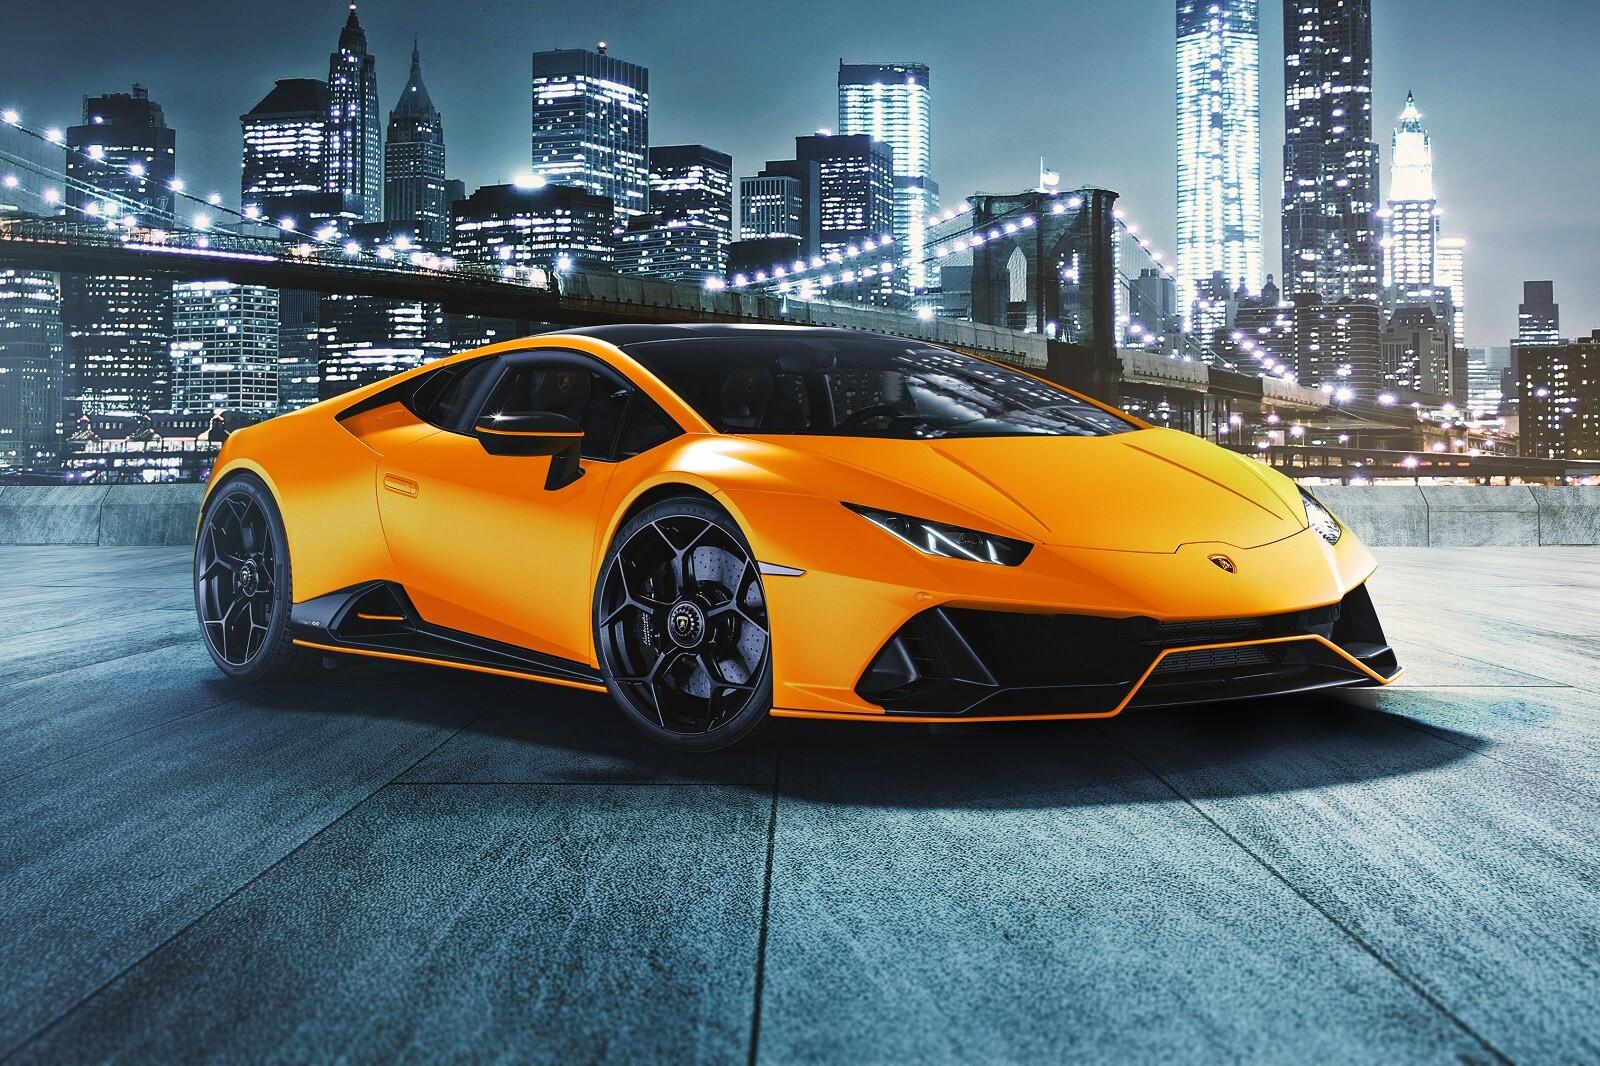 Lamborghini Huracán EVO Fluo Capsule